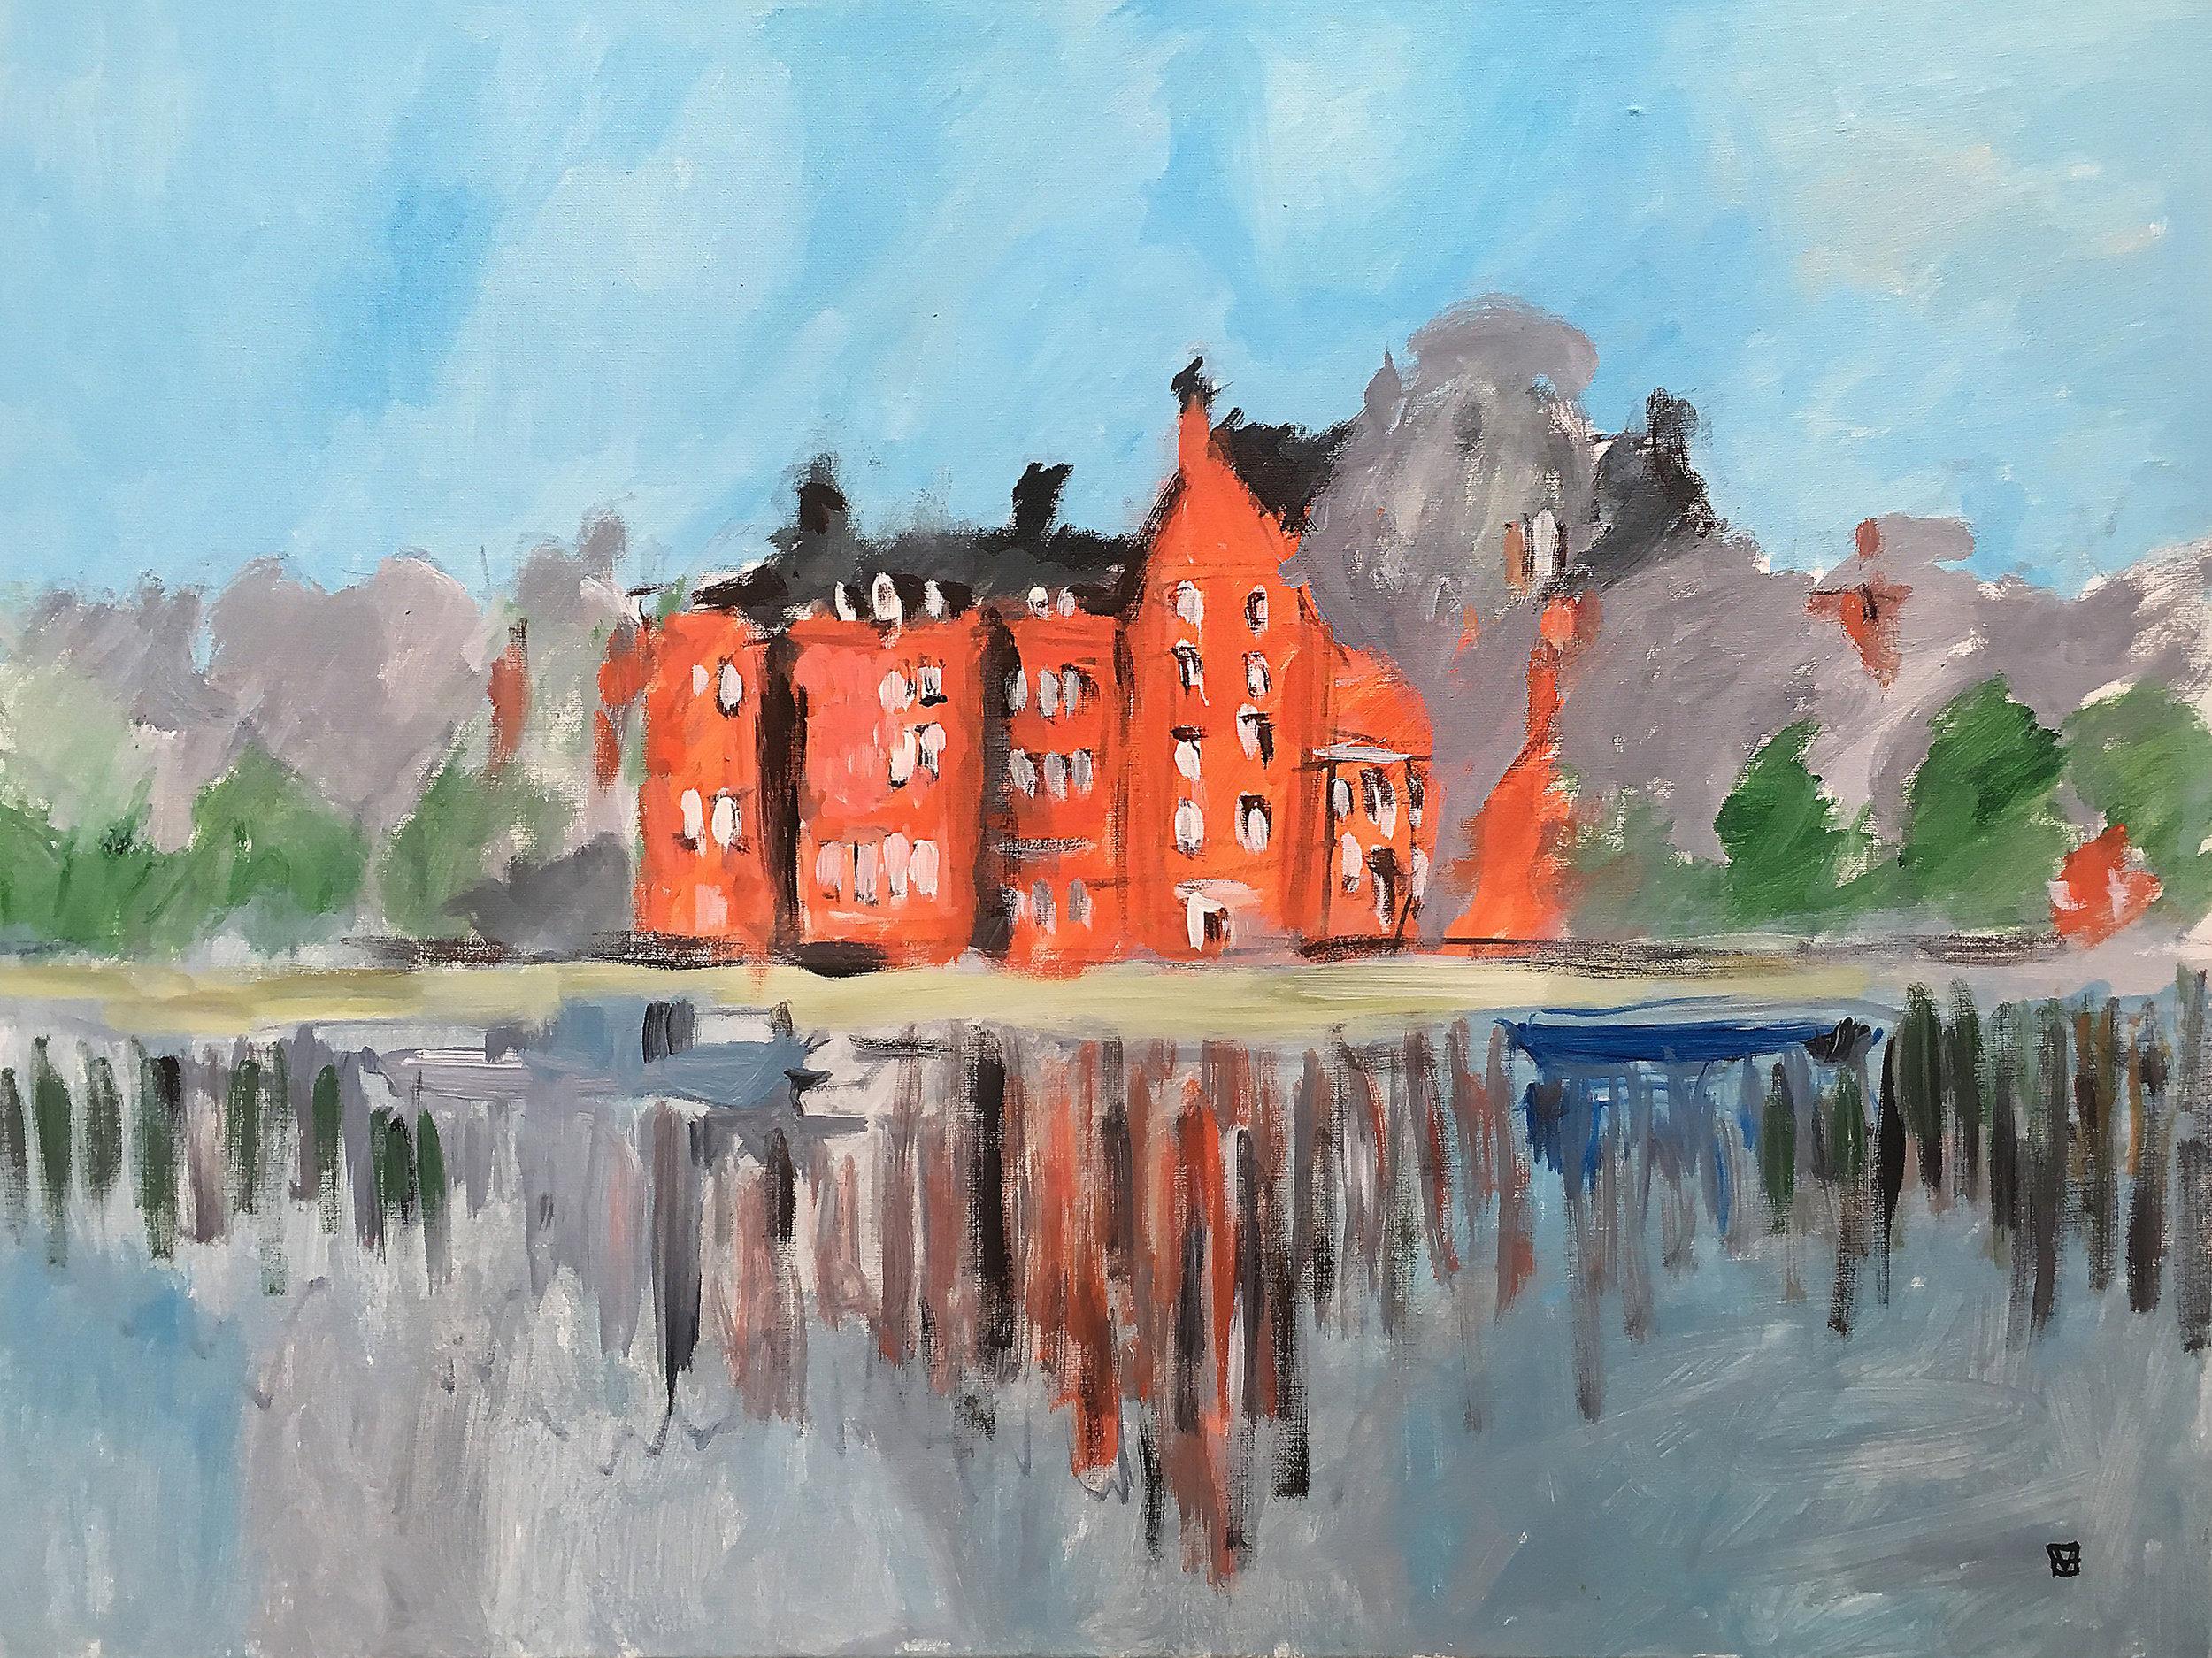 Embankment near Cheyne Walk  acrylic on canvas  £700  60 by 80 cm  unframed